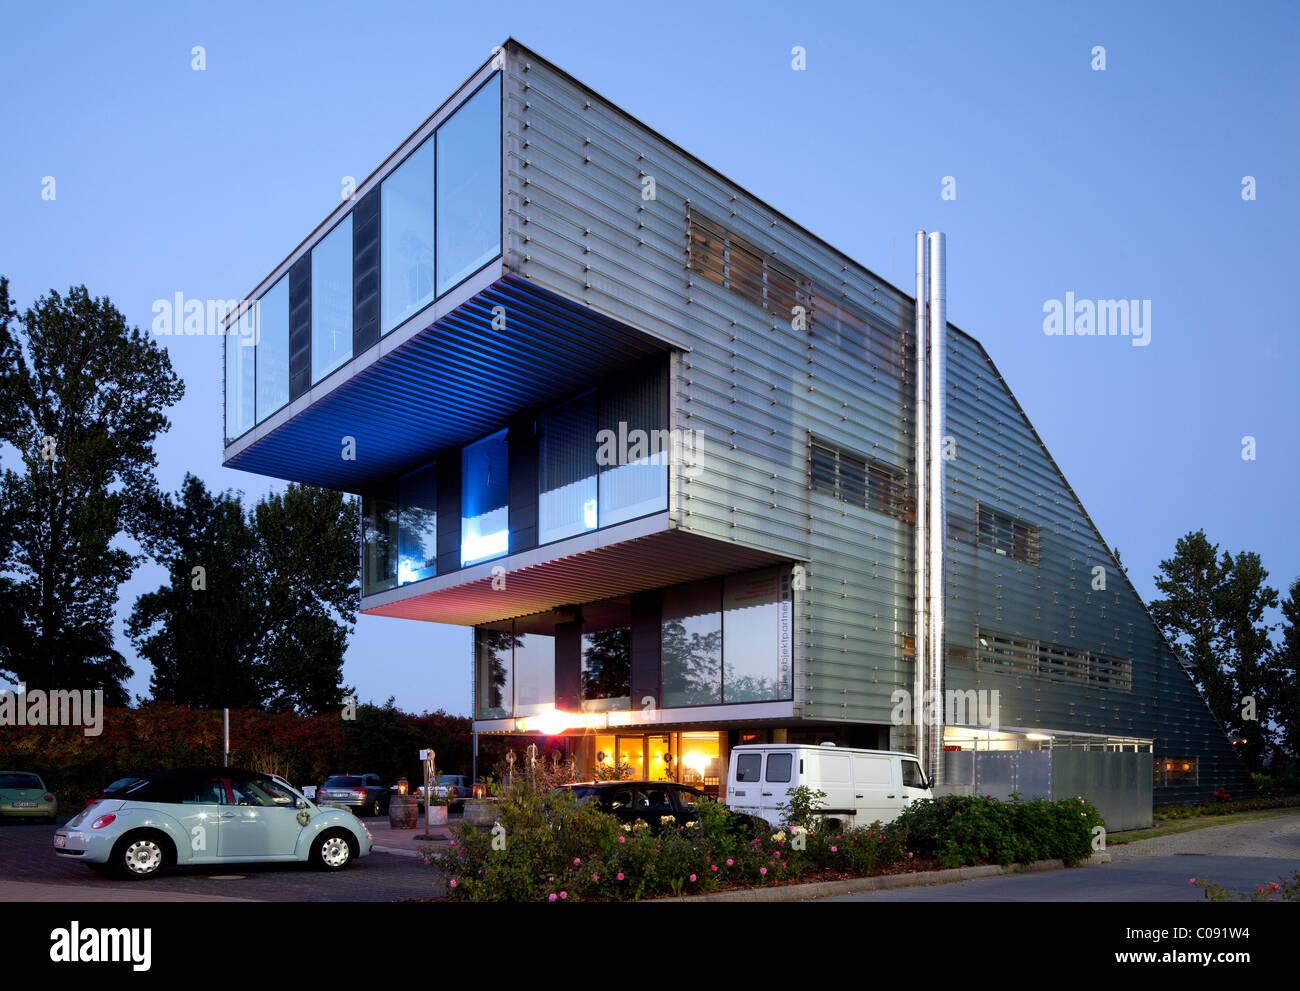 Office building, Stadtkrone Ost, Dortmund, Ruhr Area, North Rhine-Westphalia, Germany, Europe - Stock Image